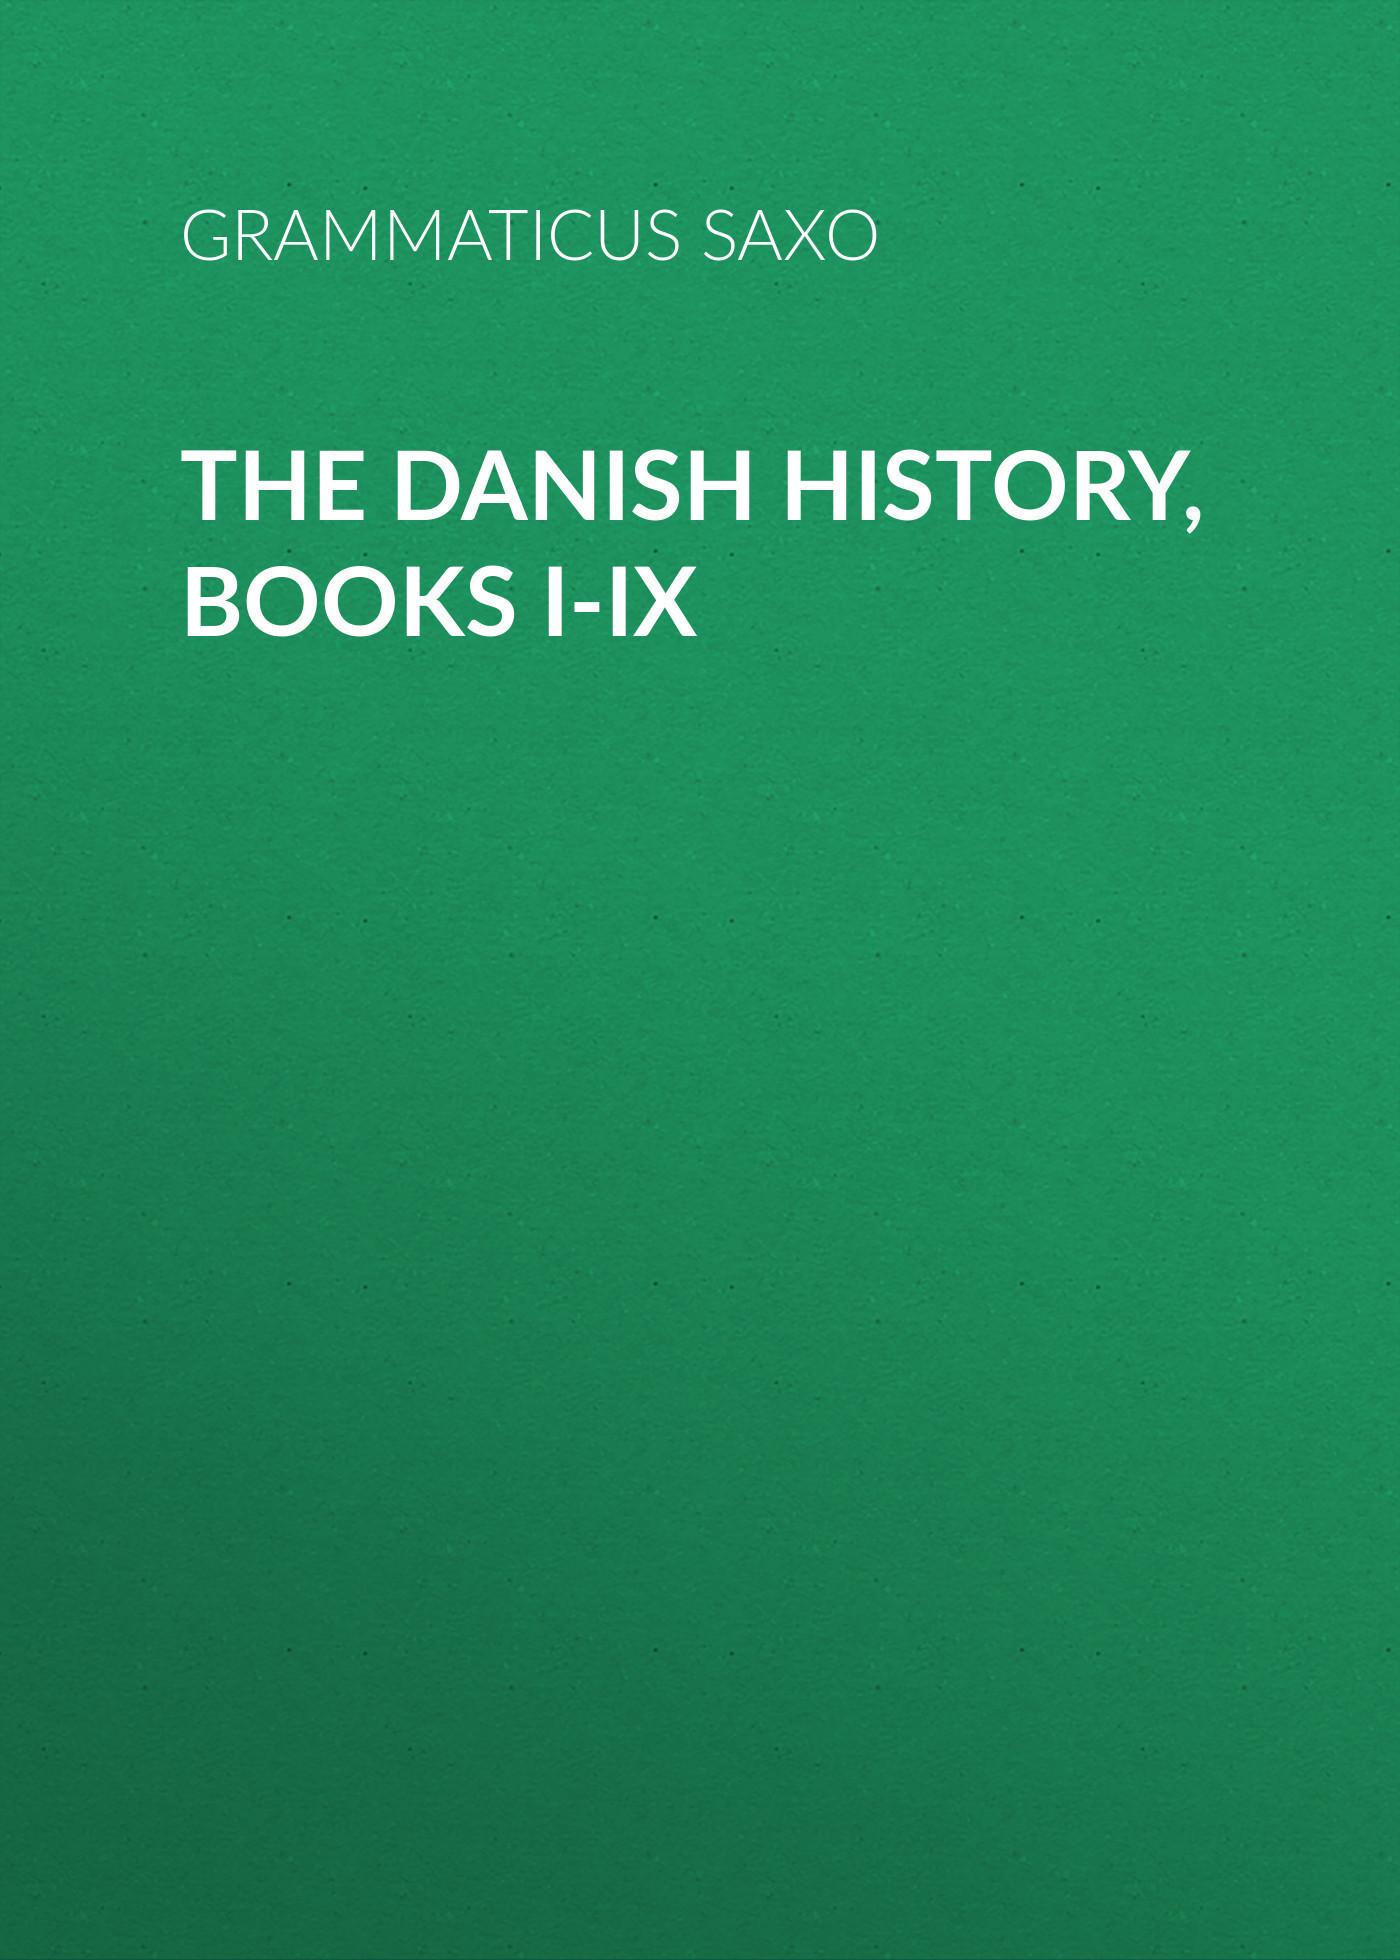 Grammaticus Saxo The Danish History, Books I-IX